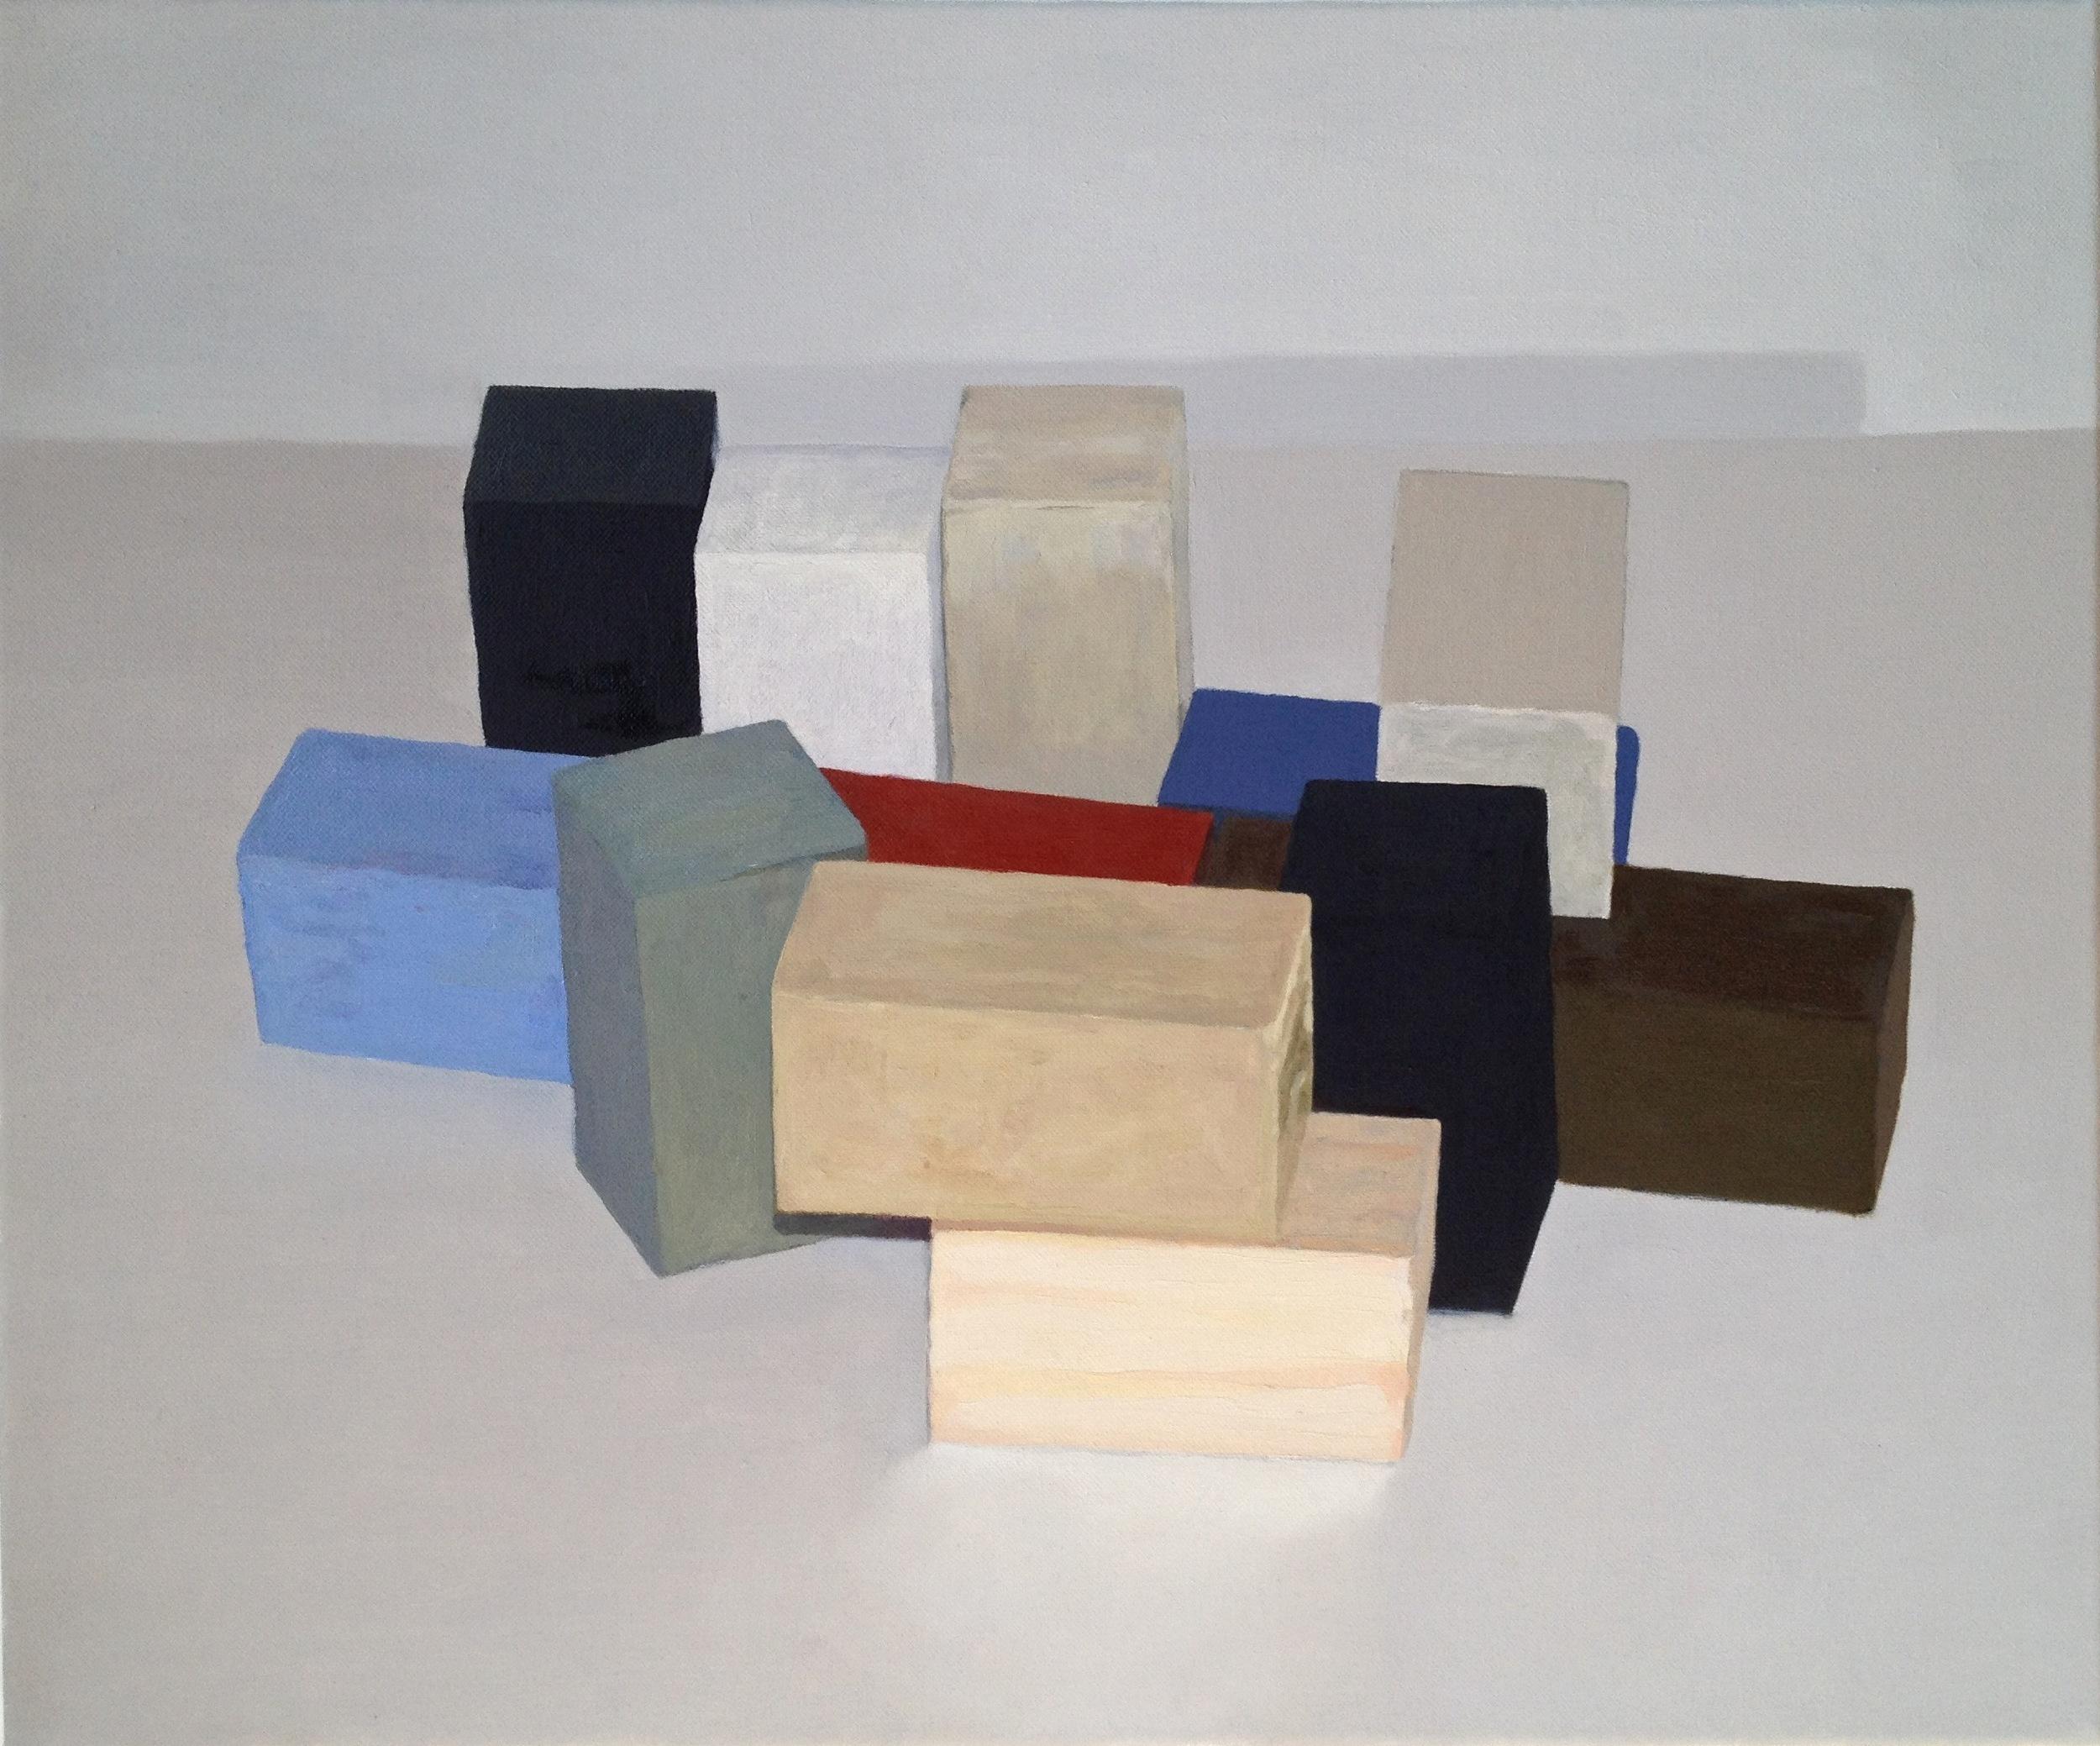 IM1210 Painted Blocks #XX (Morandi's Viewfinder) IMG_2731.jpg